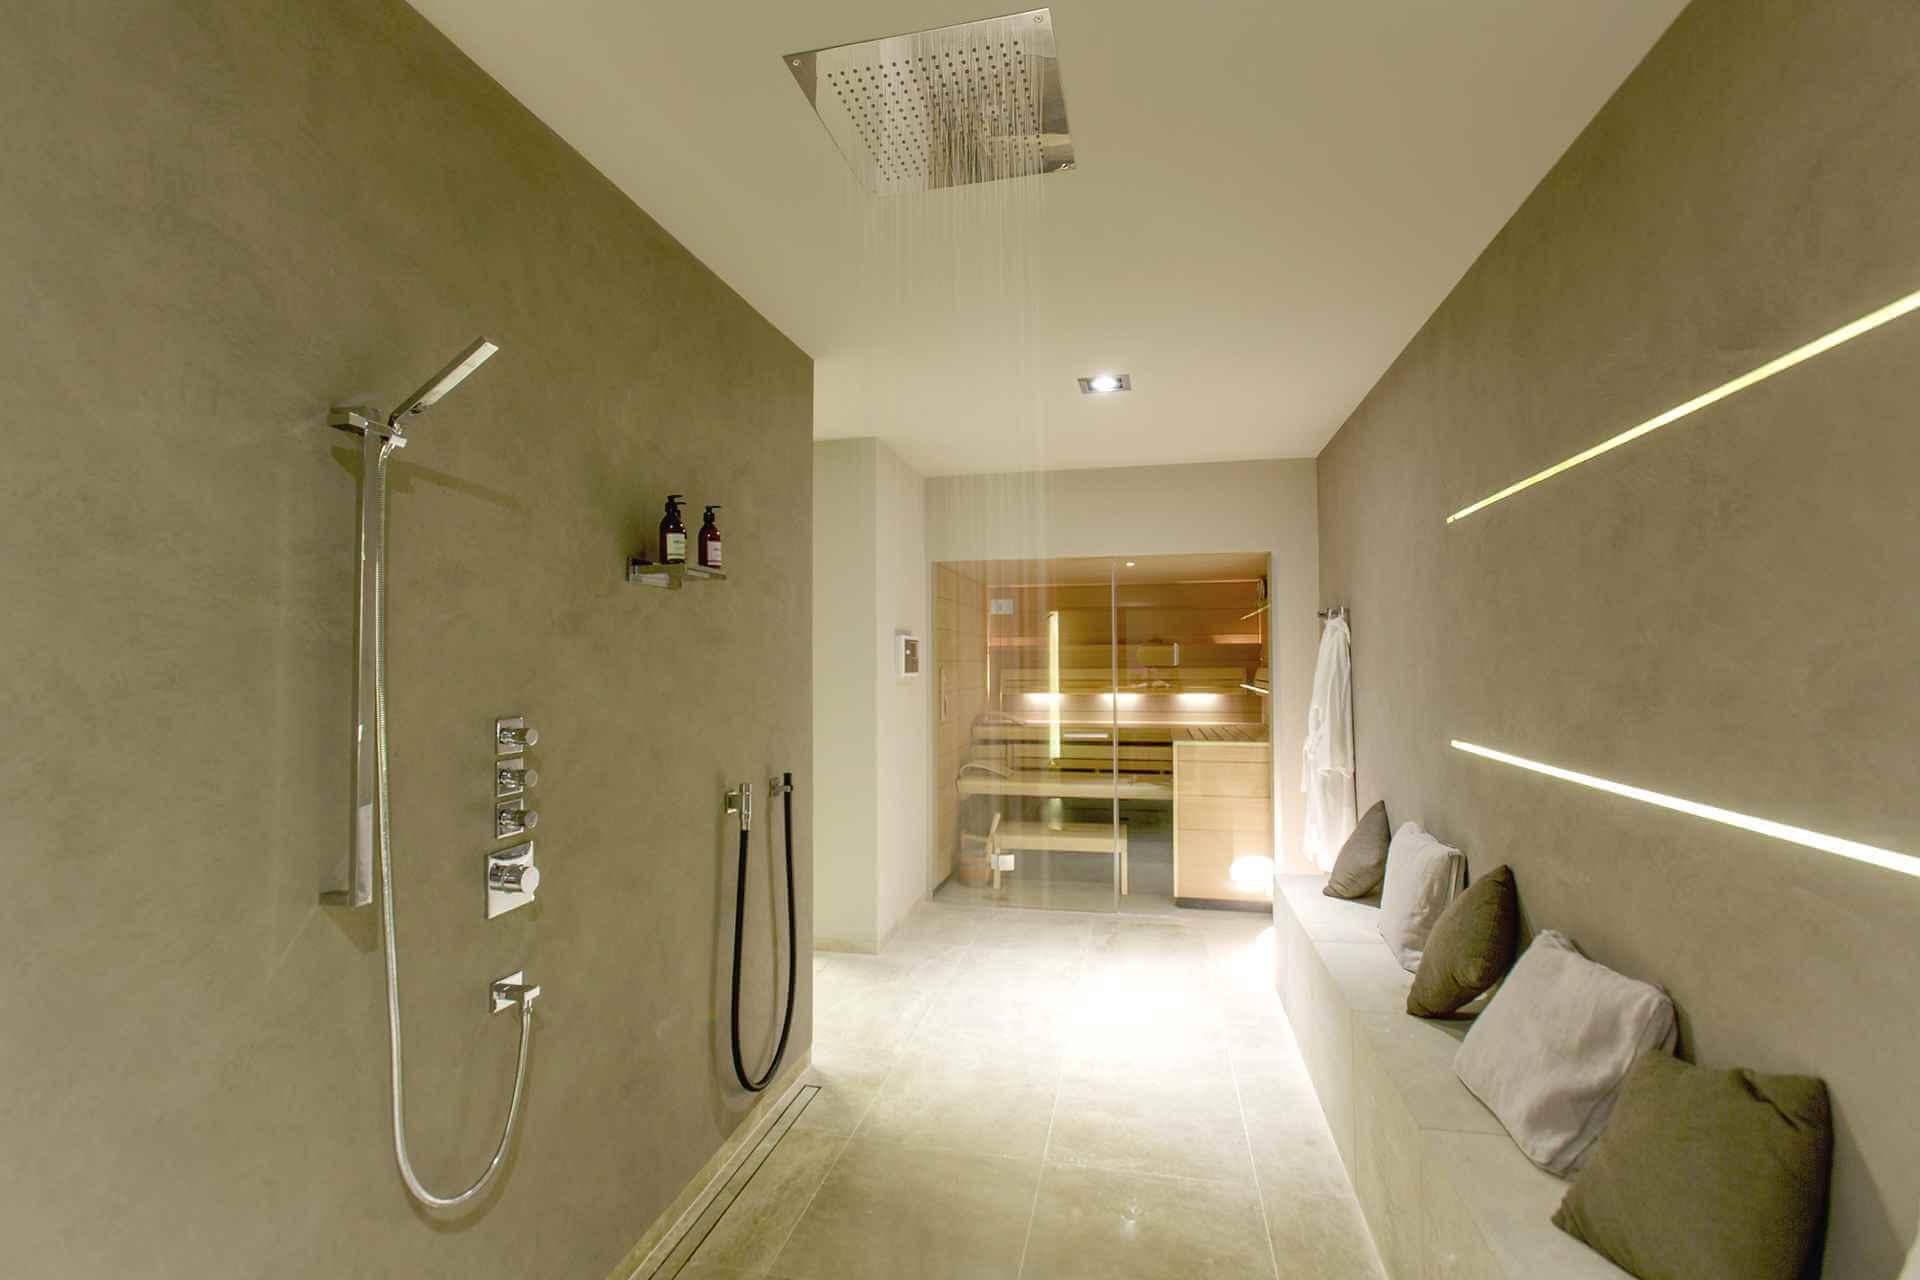 01-353 Villa with indoor pool Mallorca Southwest Bild 23